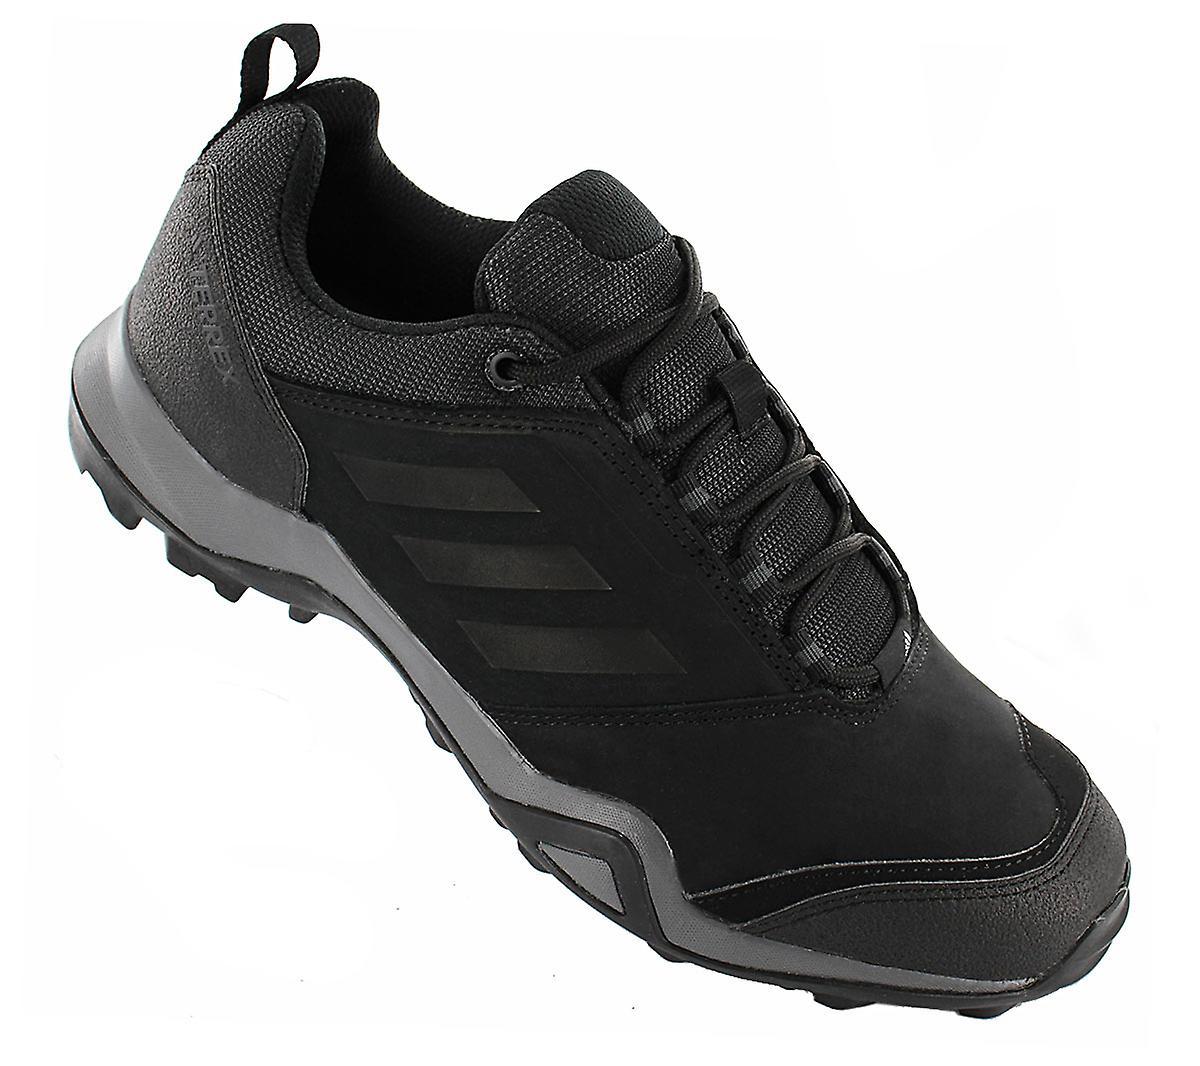 Adidas Terrex Brushwood Leather - Herren Trail-running Schuhe Schwarz Ac7851 Sneakers Sportschuhe